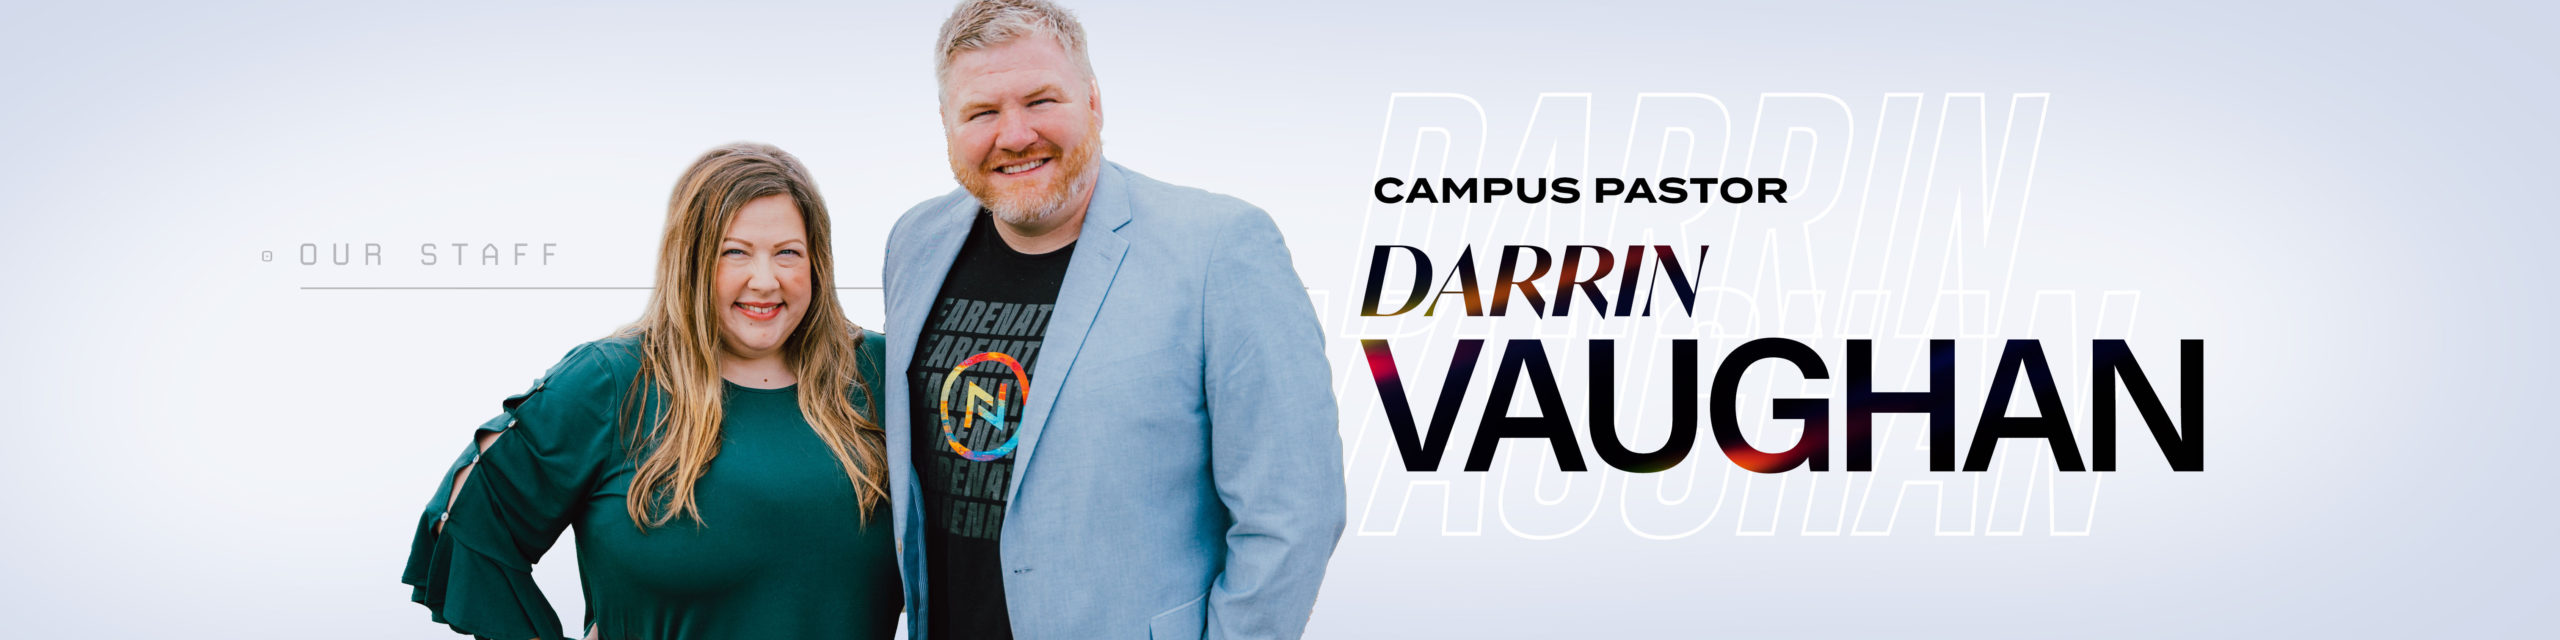 Campus Pastor Darrin Vaughan of Nations Church Orlando